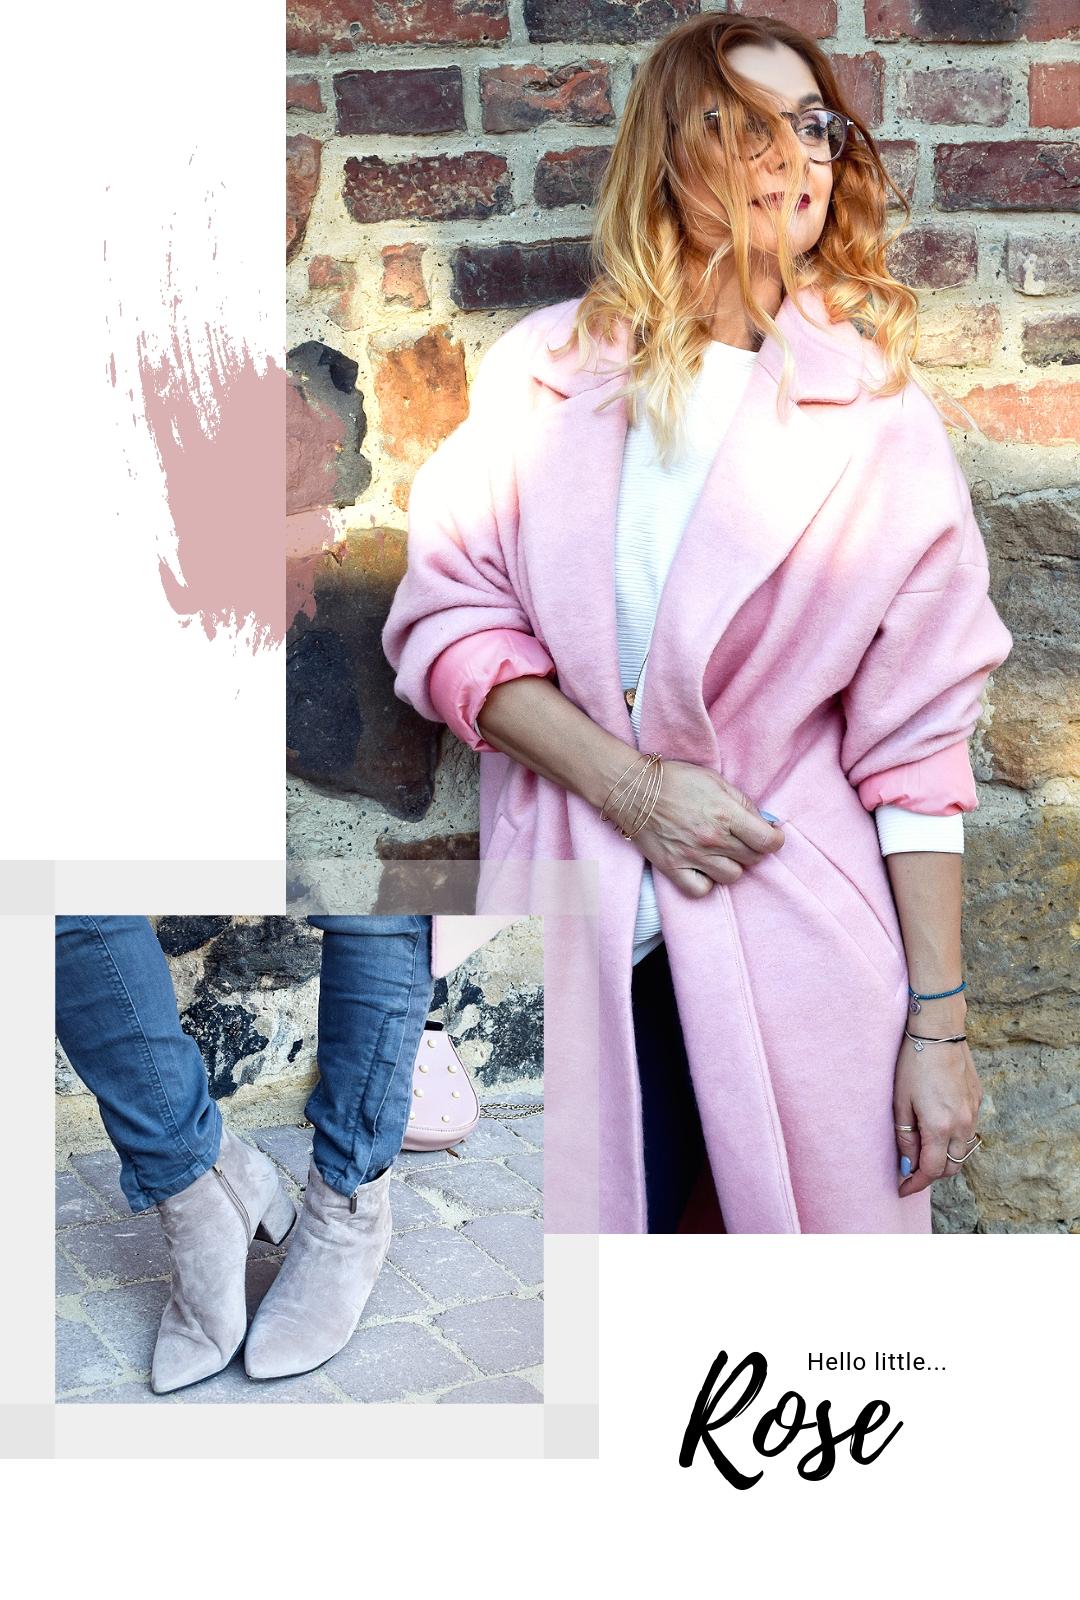 steingraue Jeans und Rosa Mantel, Oversize Mantel in Rosa